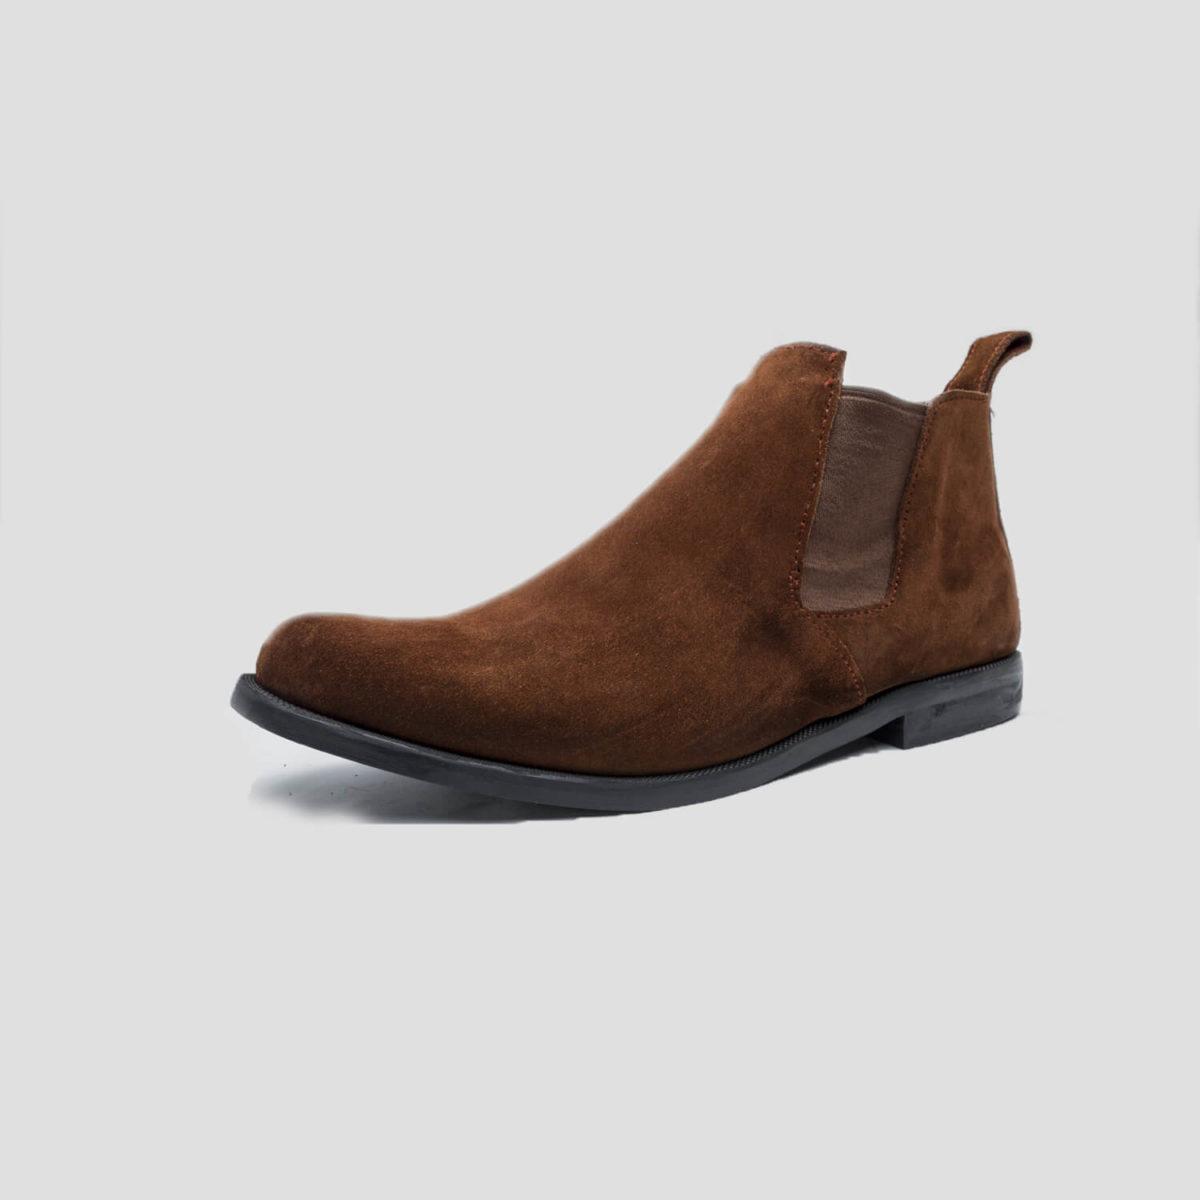 lennon chelsea boots brown suede zorkle shoes lagos nigeria